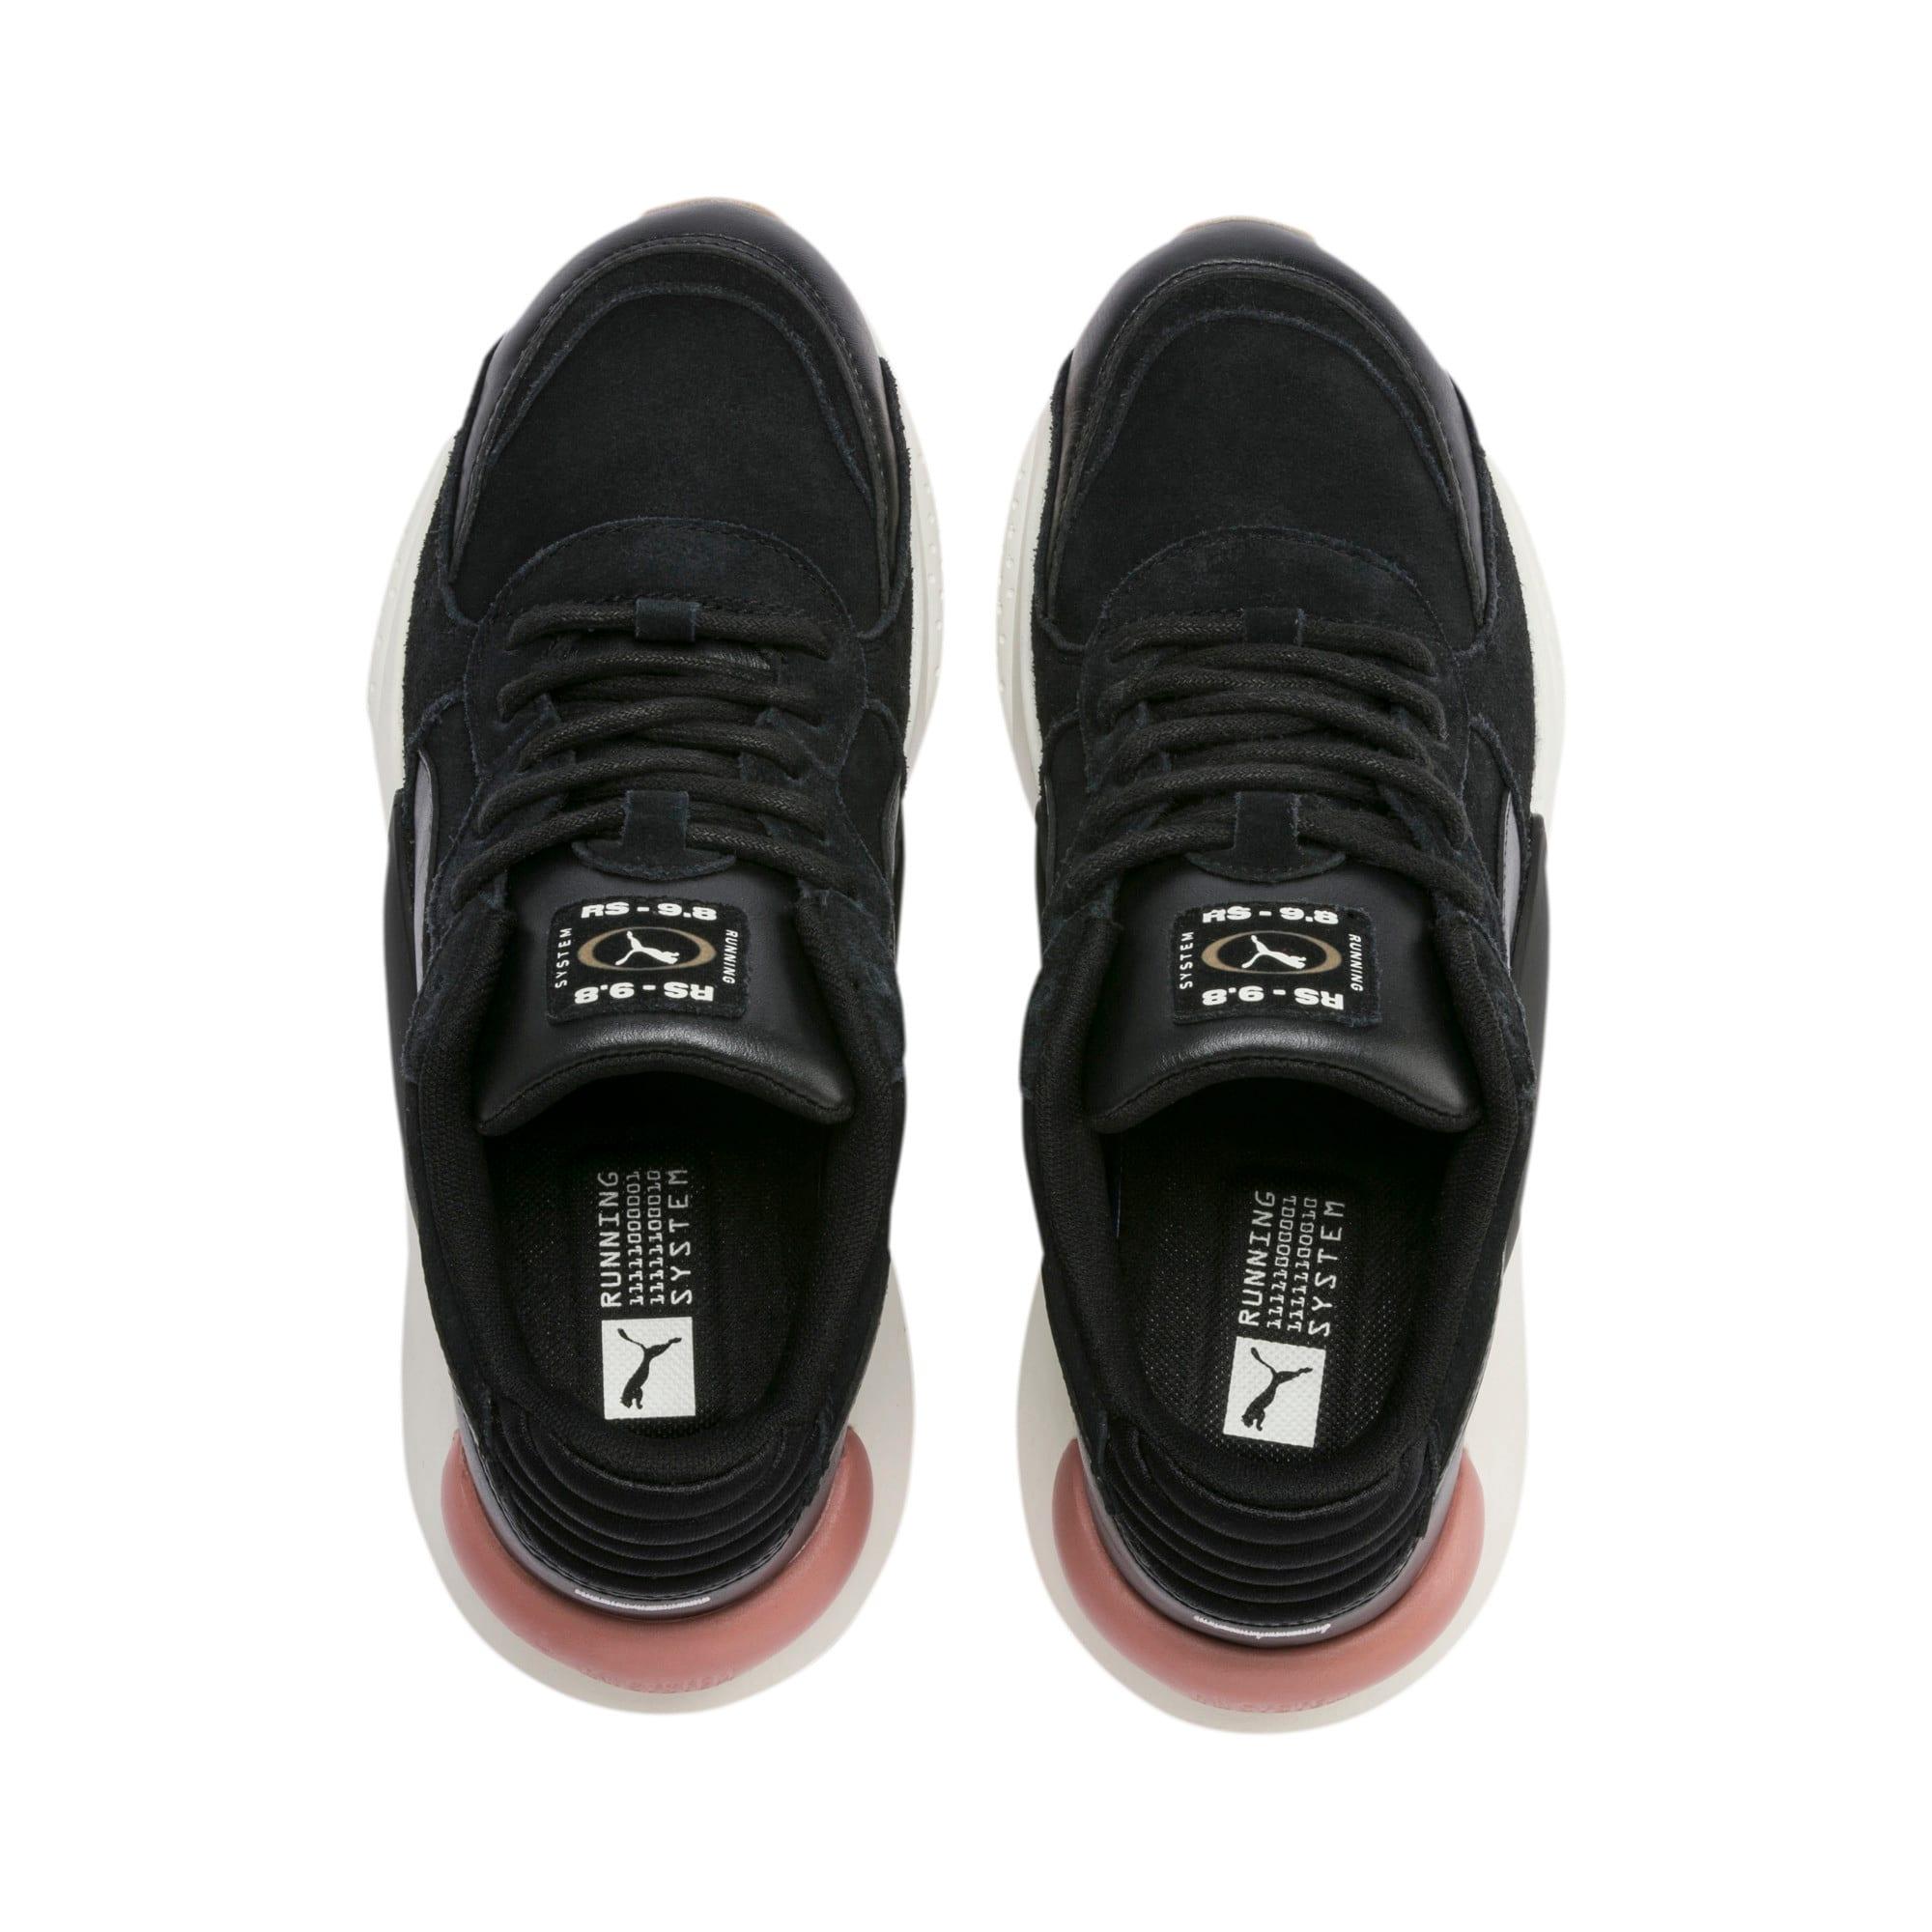 Thumbnail 7 of RS 9.8 Metallic Women's Sneakers, Puma Black Heather, medium